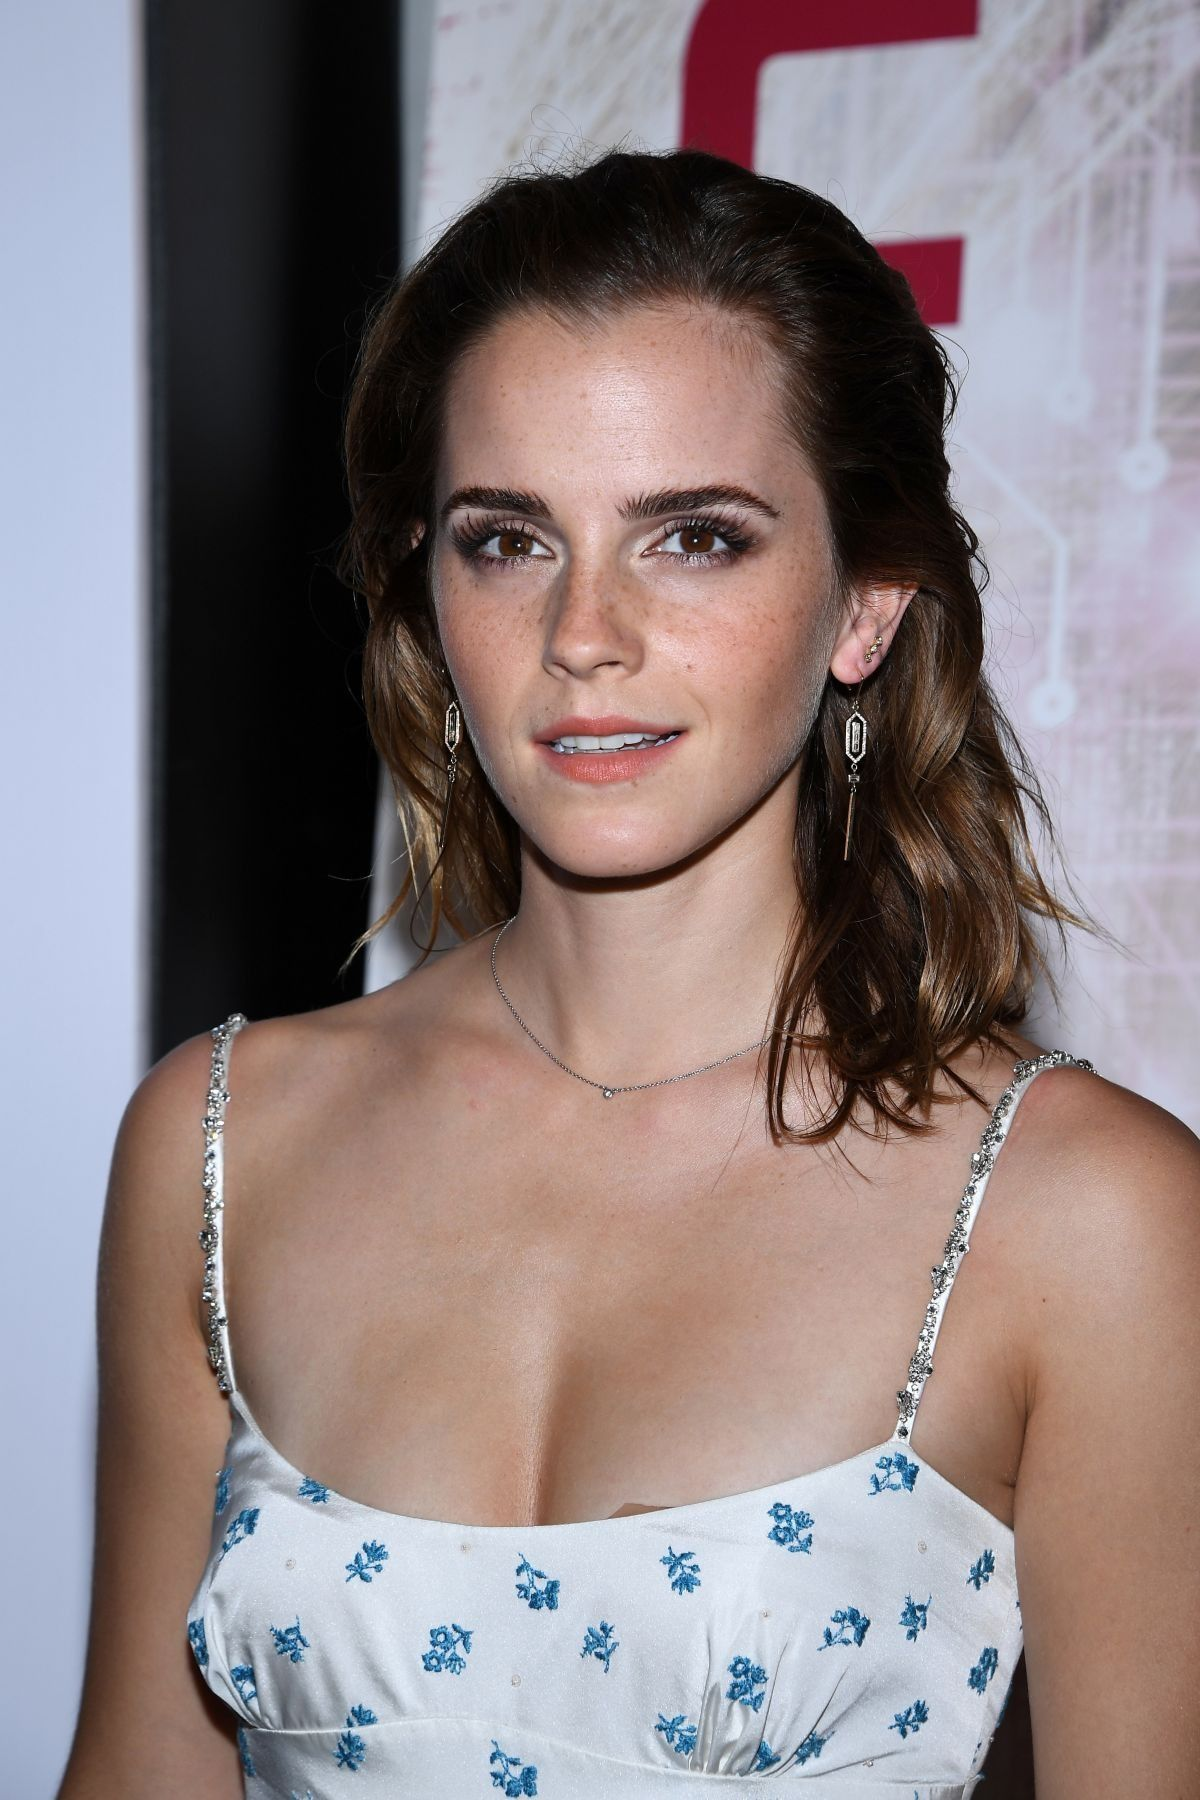 Emma Watson at The Circle Premiere, Paris (21 June, 2017)